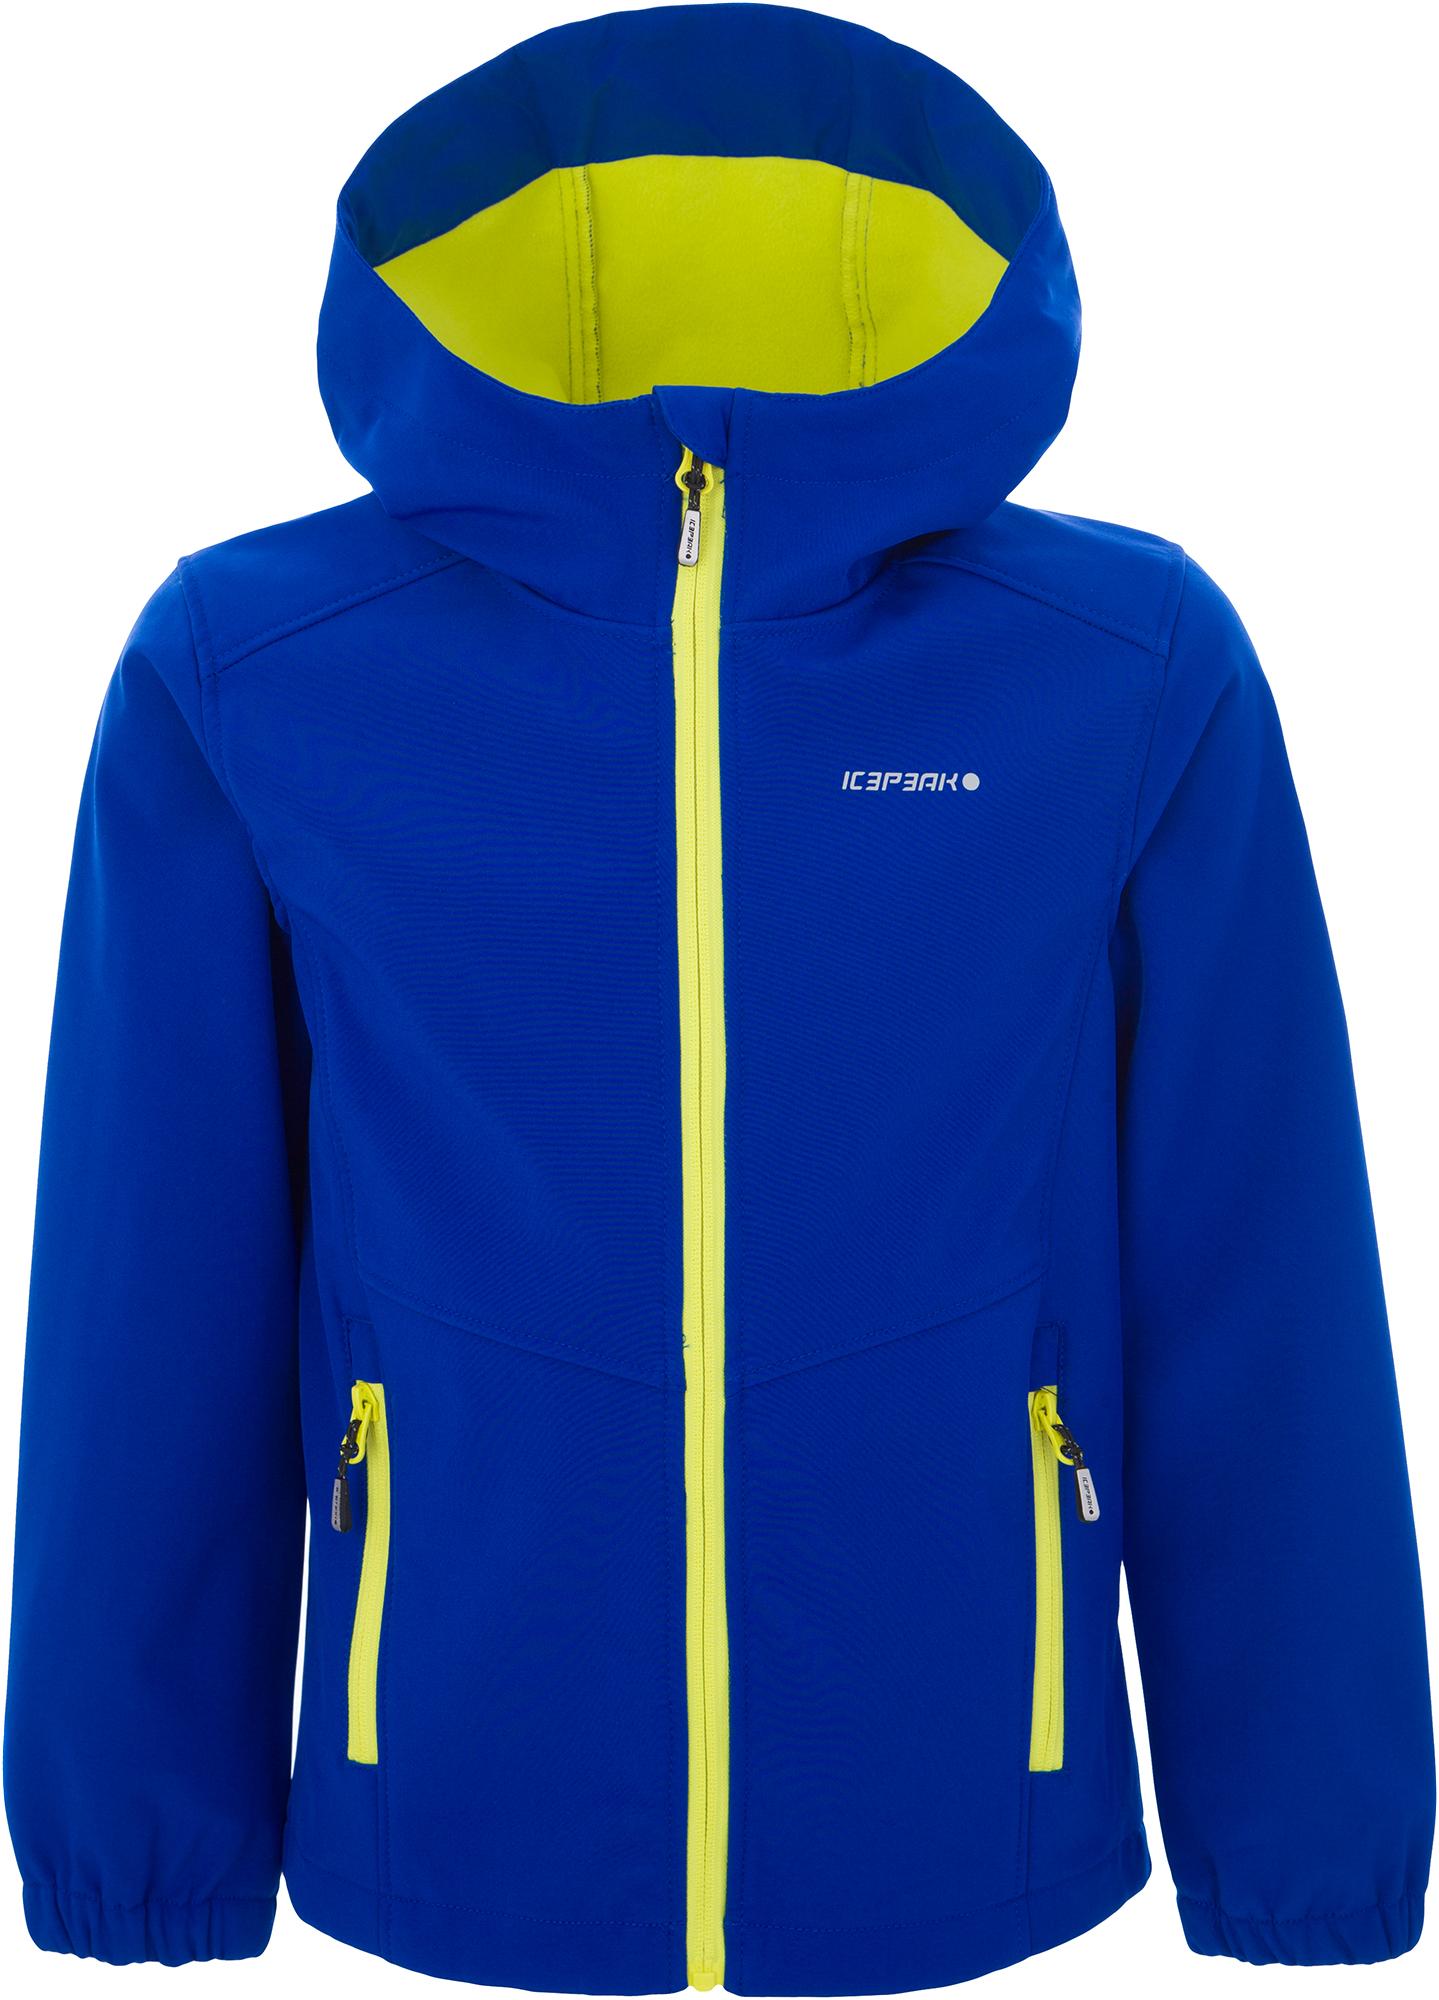 IcePeak Куртка софт-шелл для мальчиков IcePeak Teiko, размер 176 icepeak рюкзак icepeak ilma размер без размера